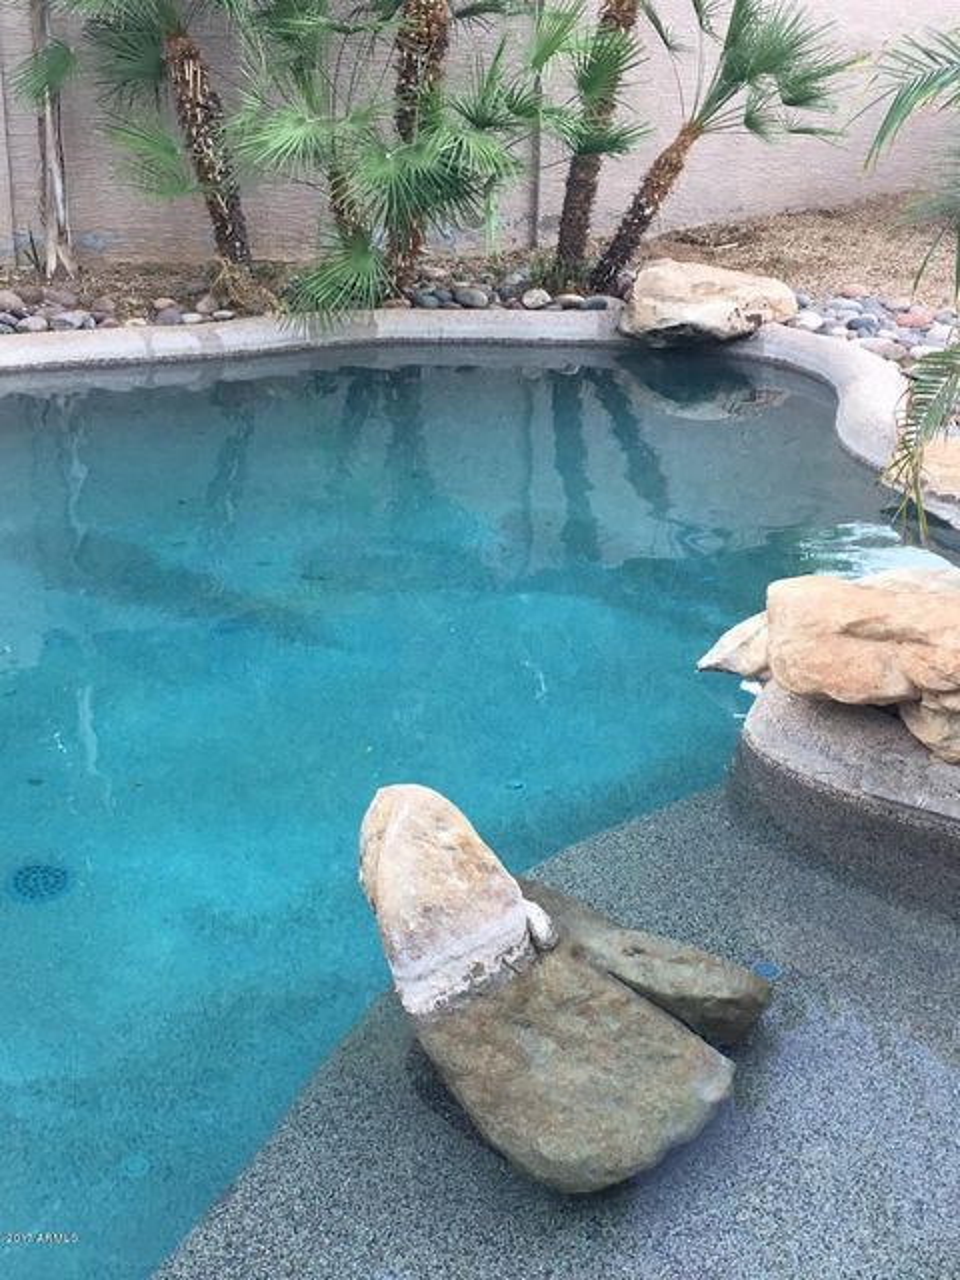 MLS 5660473 7623 E TAILFEATHER Drive, Scottsdale, AZ 85255 Scottsdale AZ Bank Owned